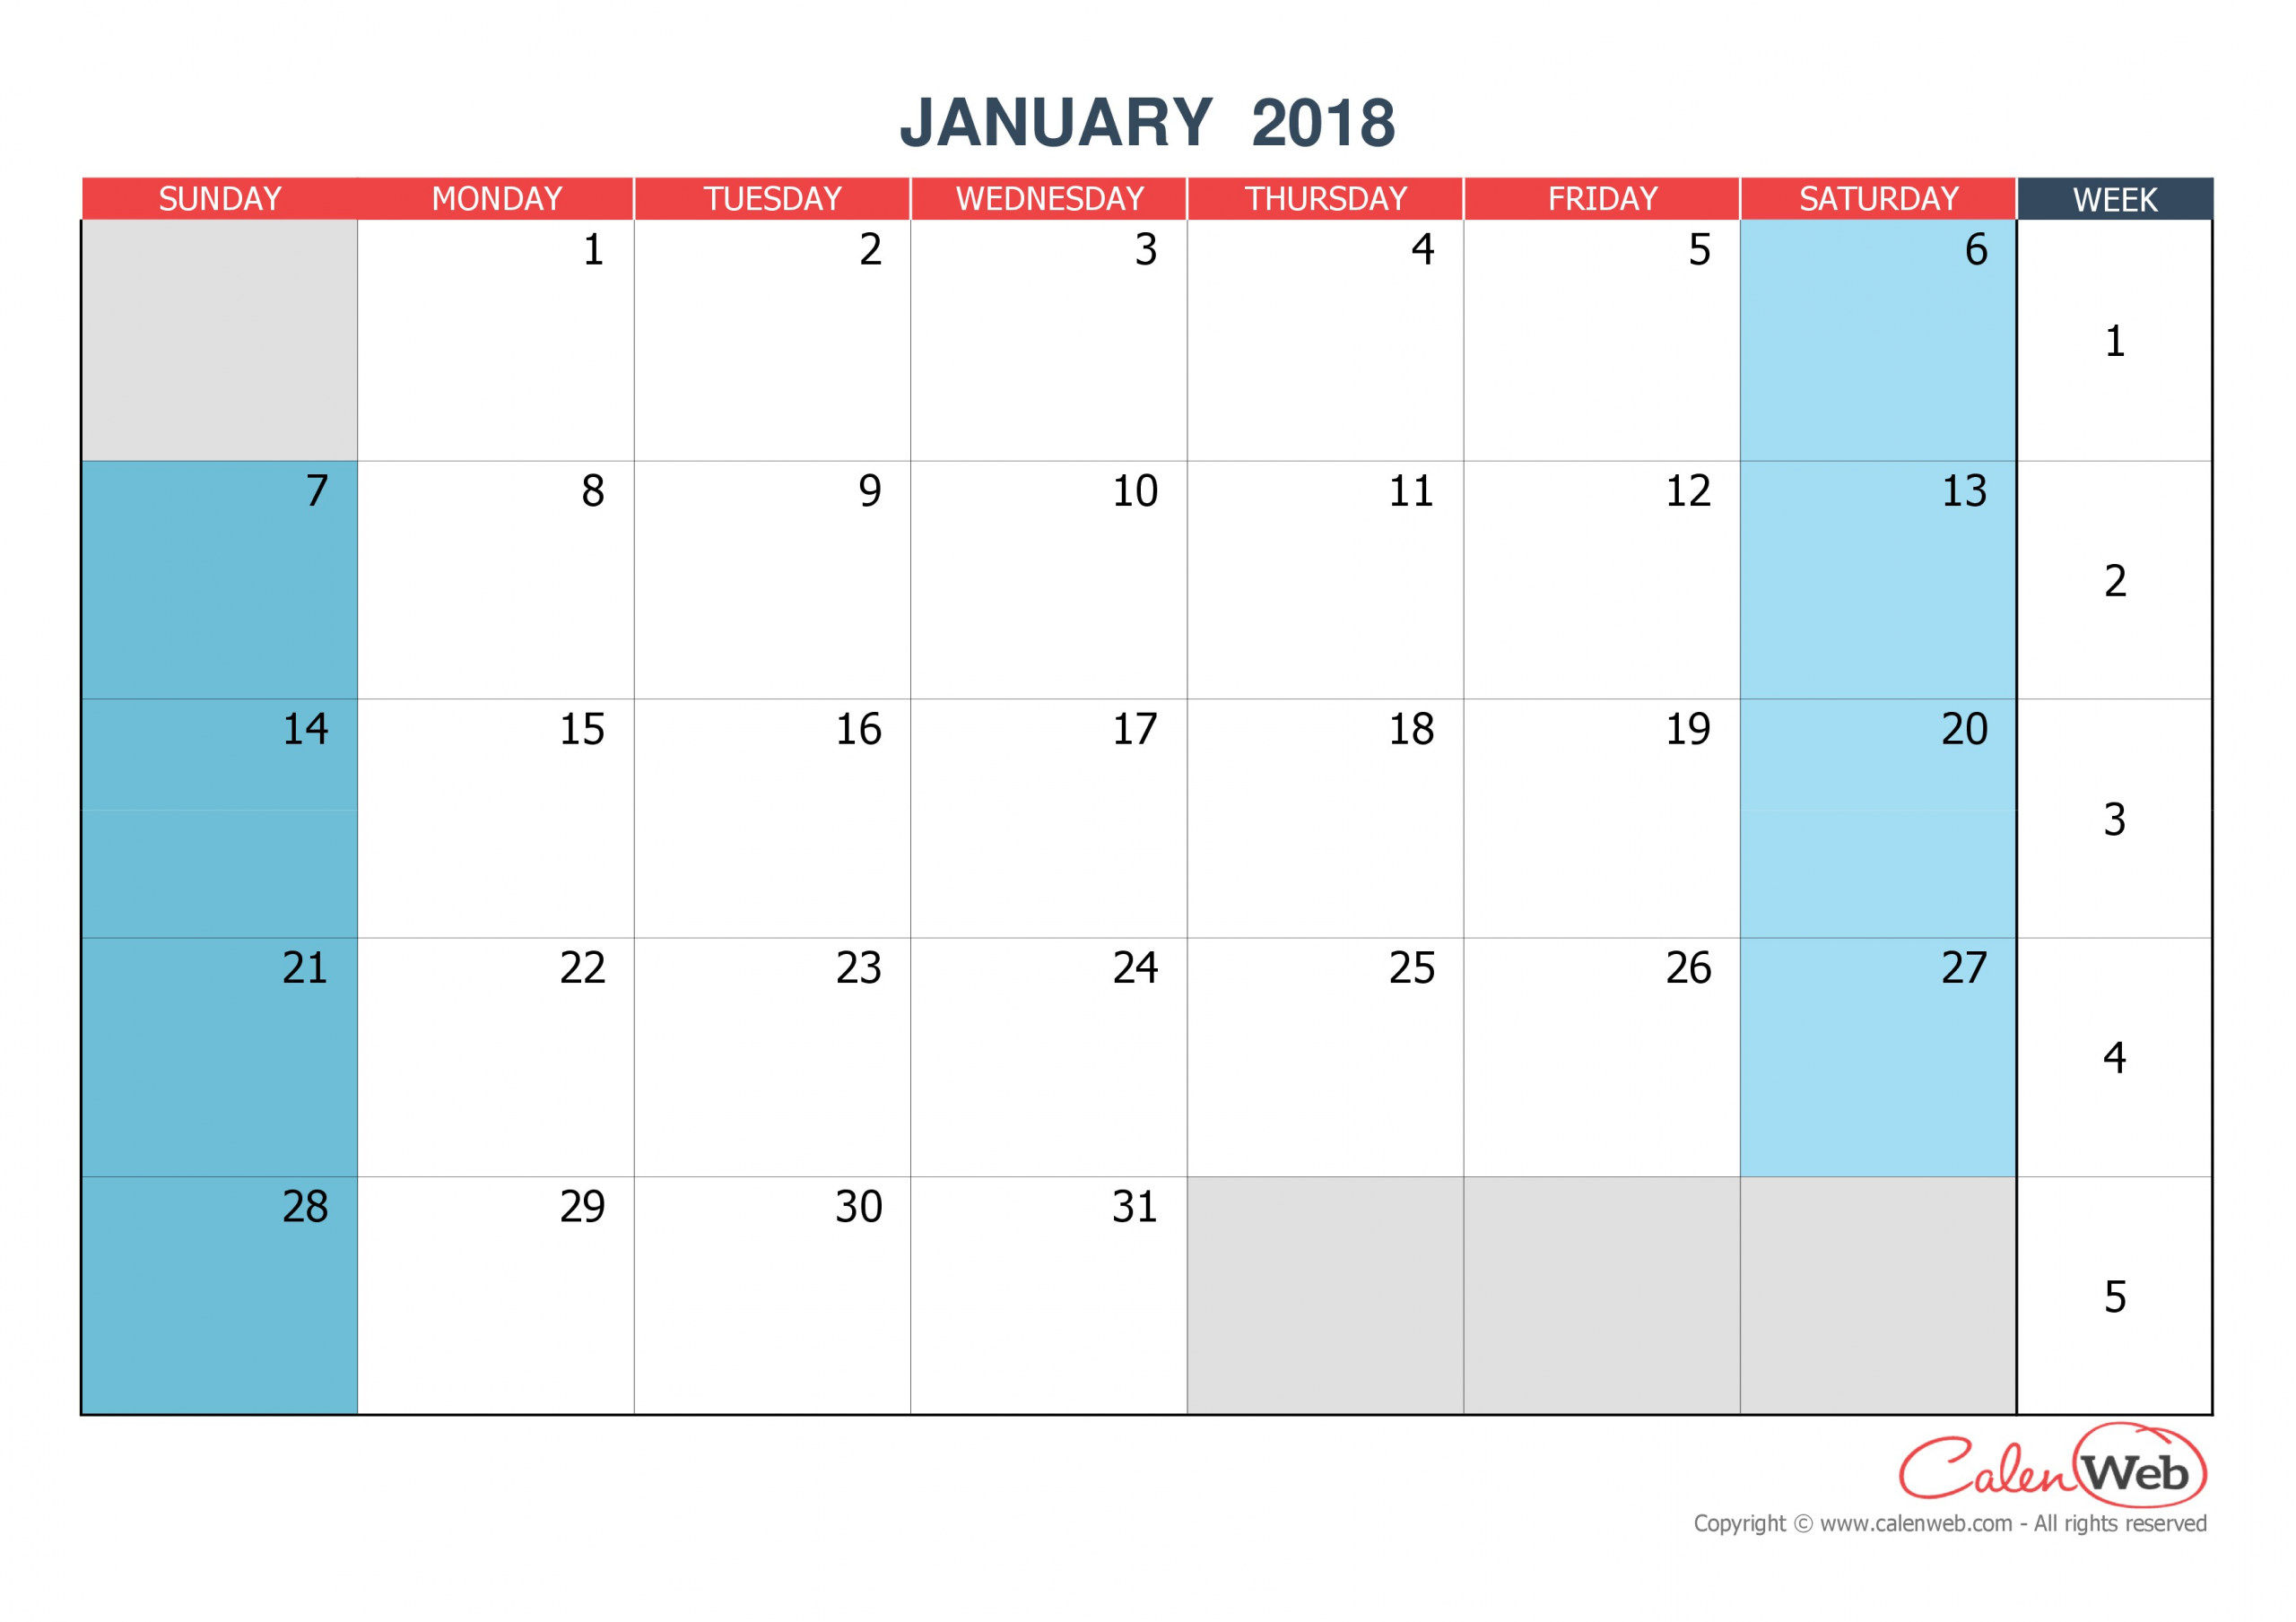 Calendario 2020 Jan Recientes January Calendar Month andoneianstern Of Calendario 2020 Jan Más Populares Free Excel Calendar Templates Monthly Template Ic 2020 S